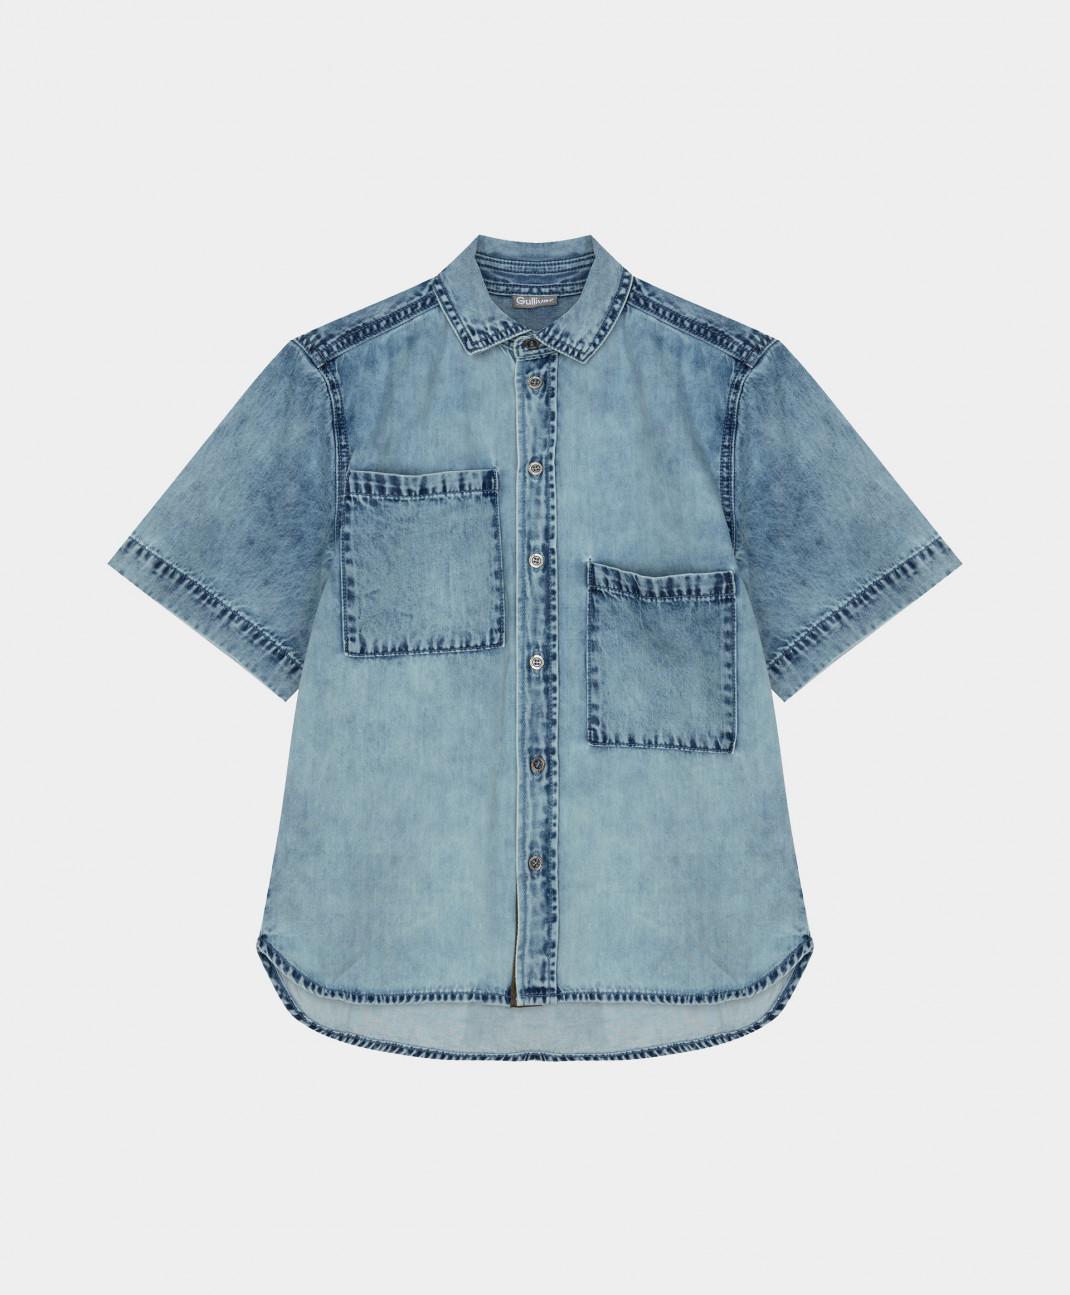 Рубашка Gulliver джинсовая 12111BJC2303 р.164